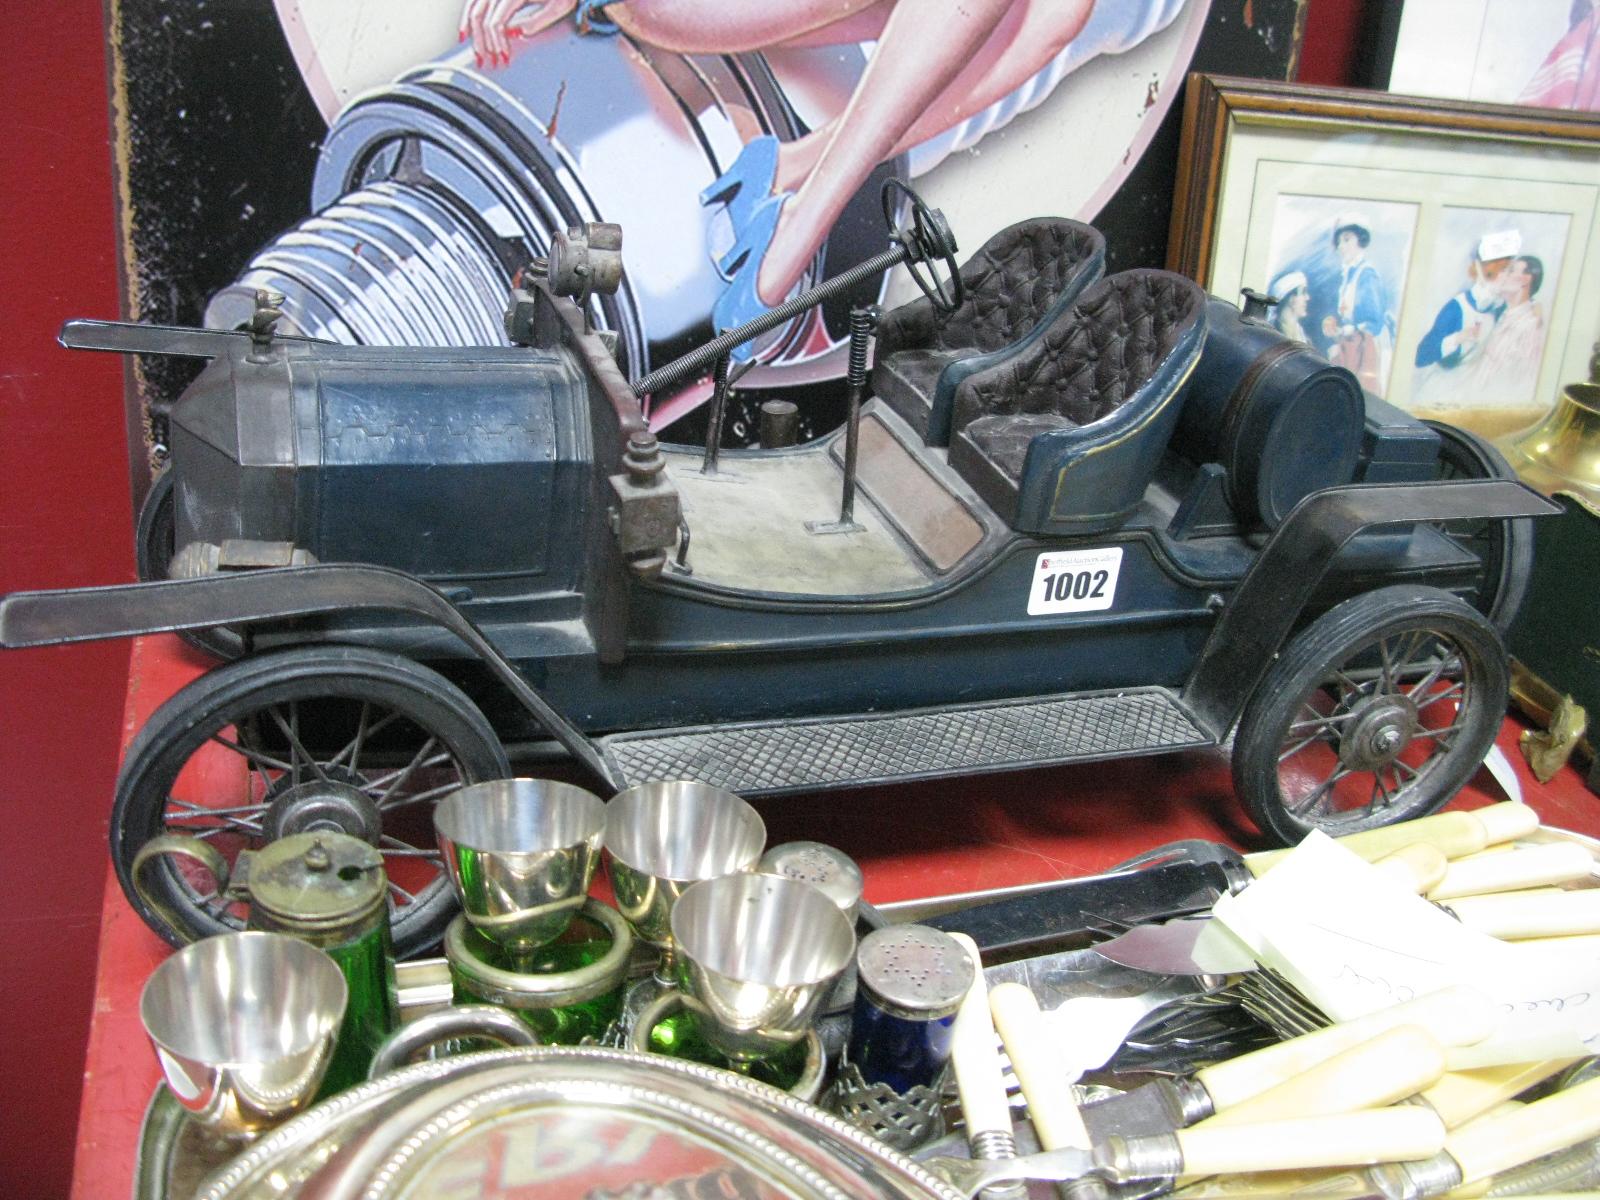 Lot 1002 - A Late XX Century Model Vintage Car, length 52cm.